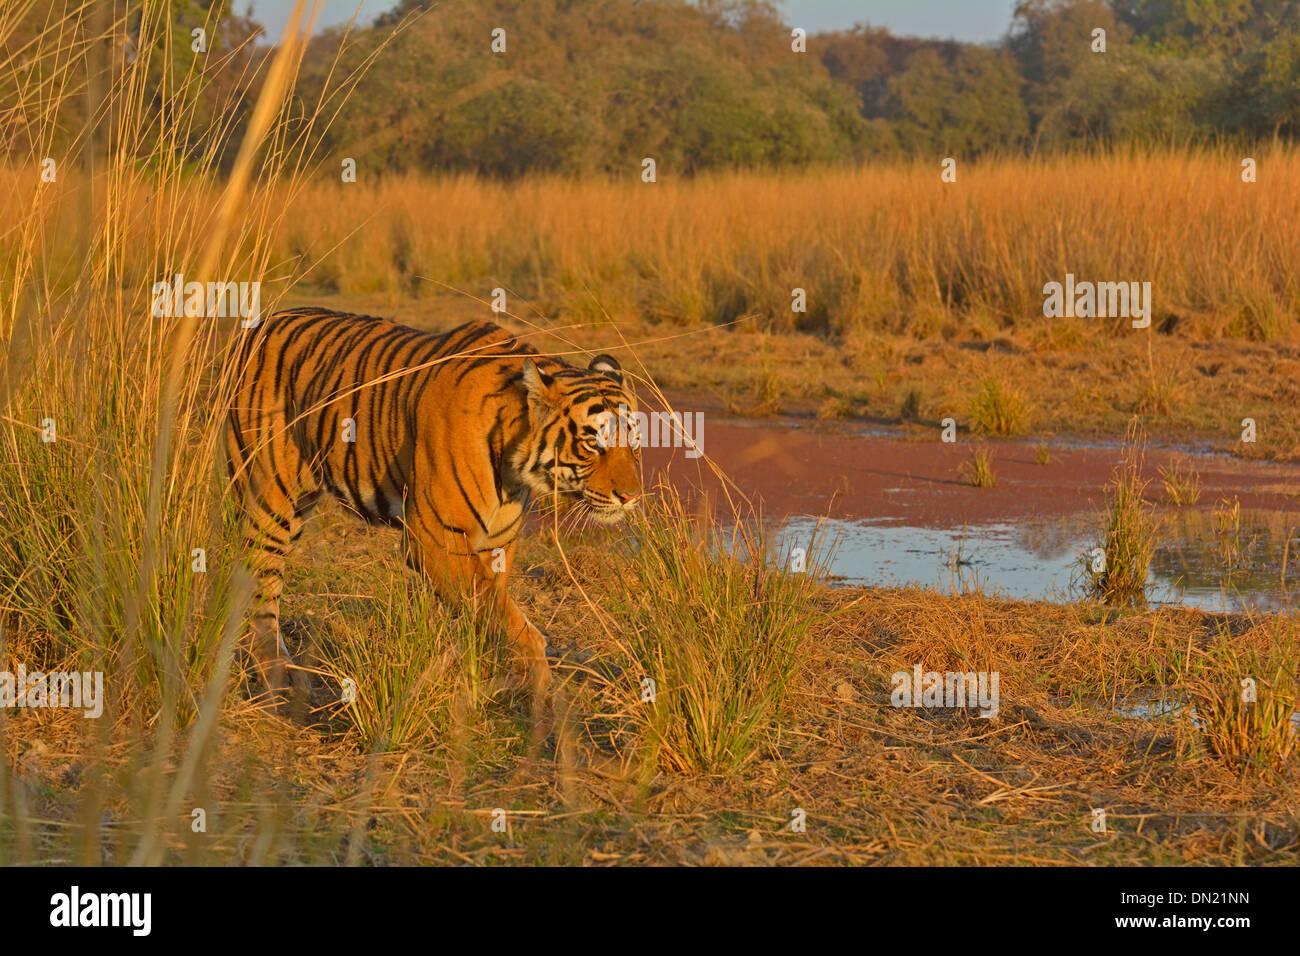 Tiger patrolling his territory in Ranthambhore national park - Stock Image